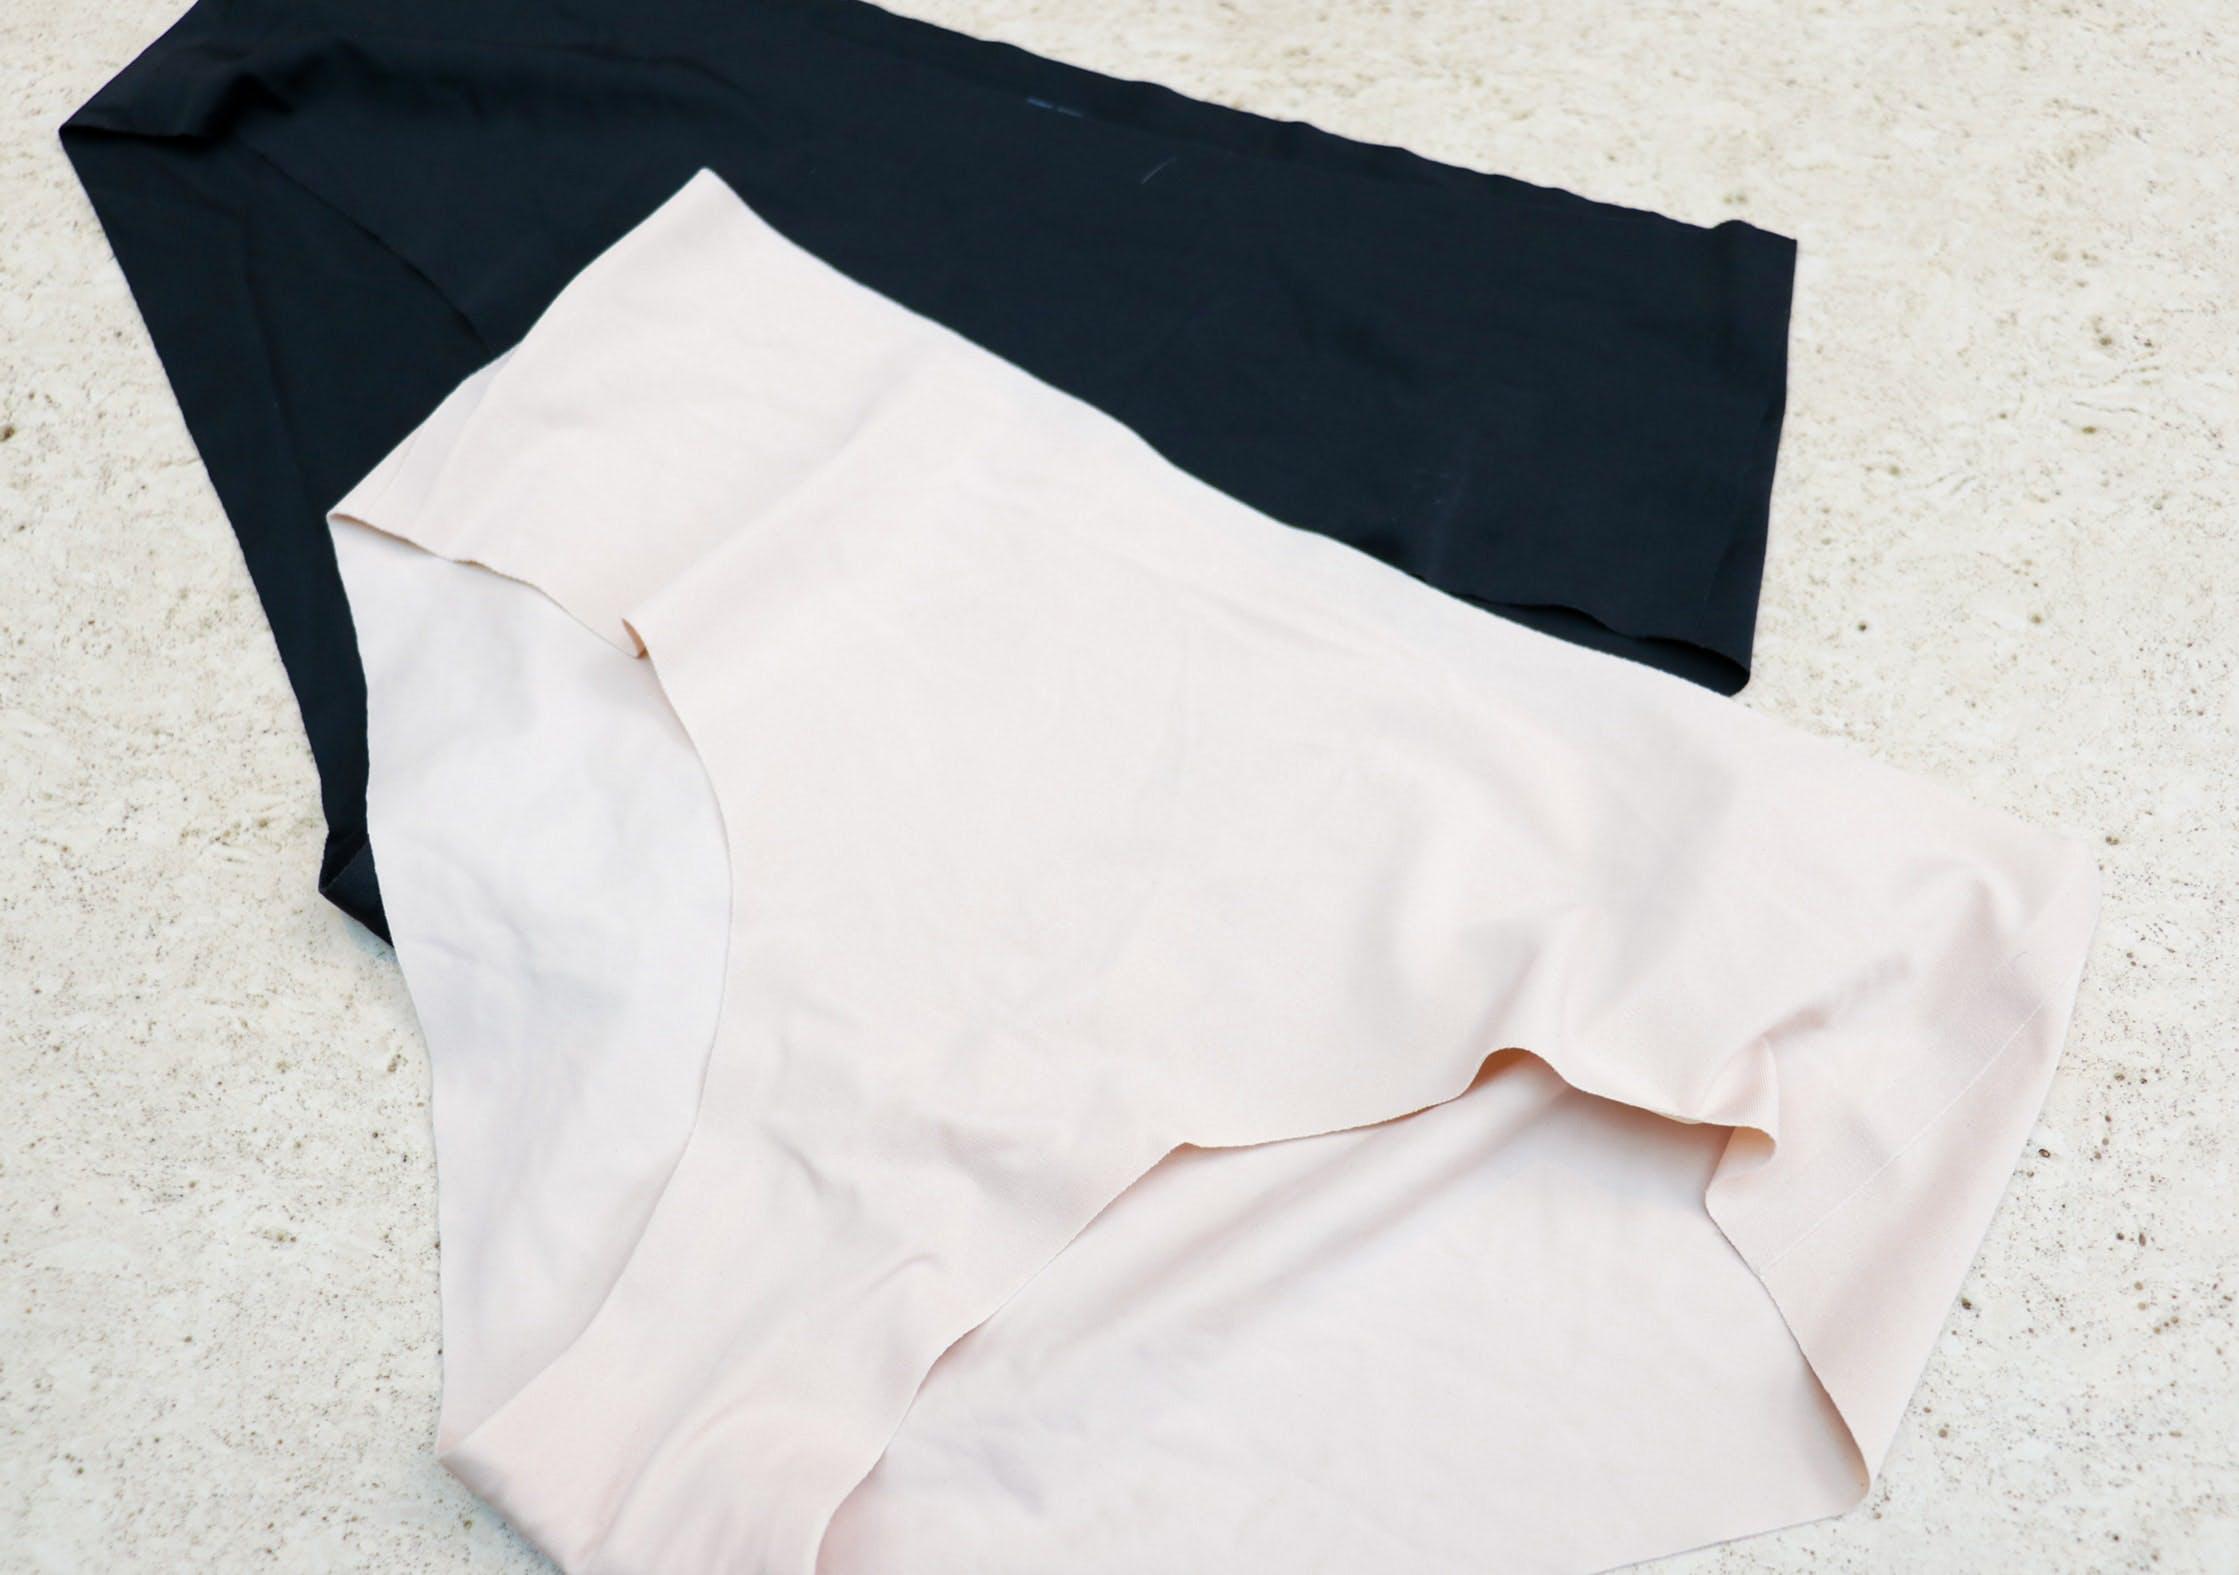 Uniqlo AIRism Ultra Seamless Bikini Shorts Durability & Testing